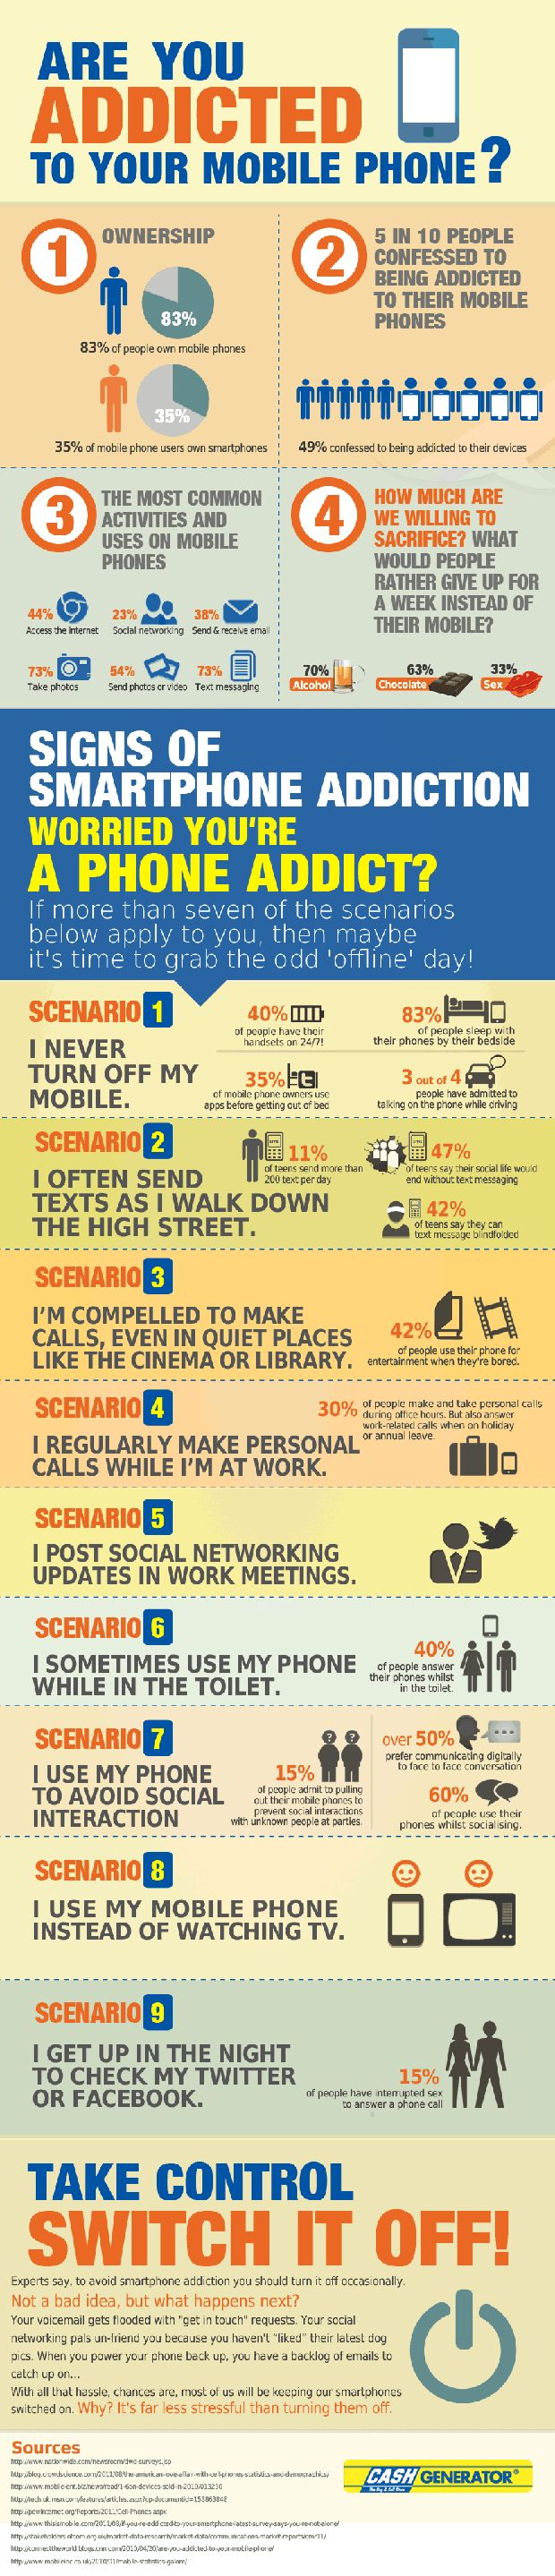 InfoGraphics - Mobile phone addiction